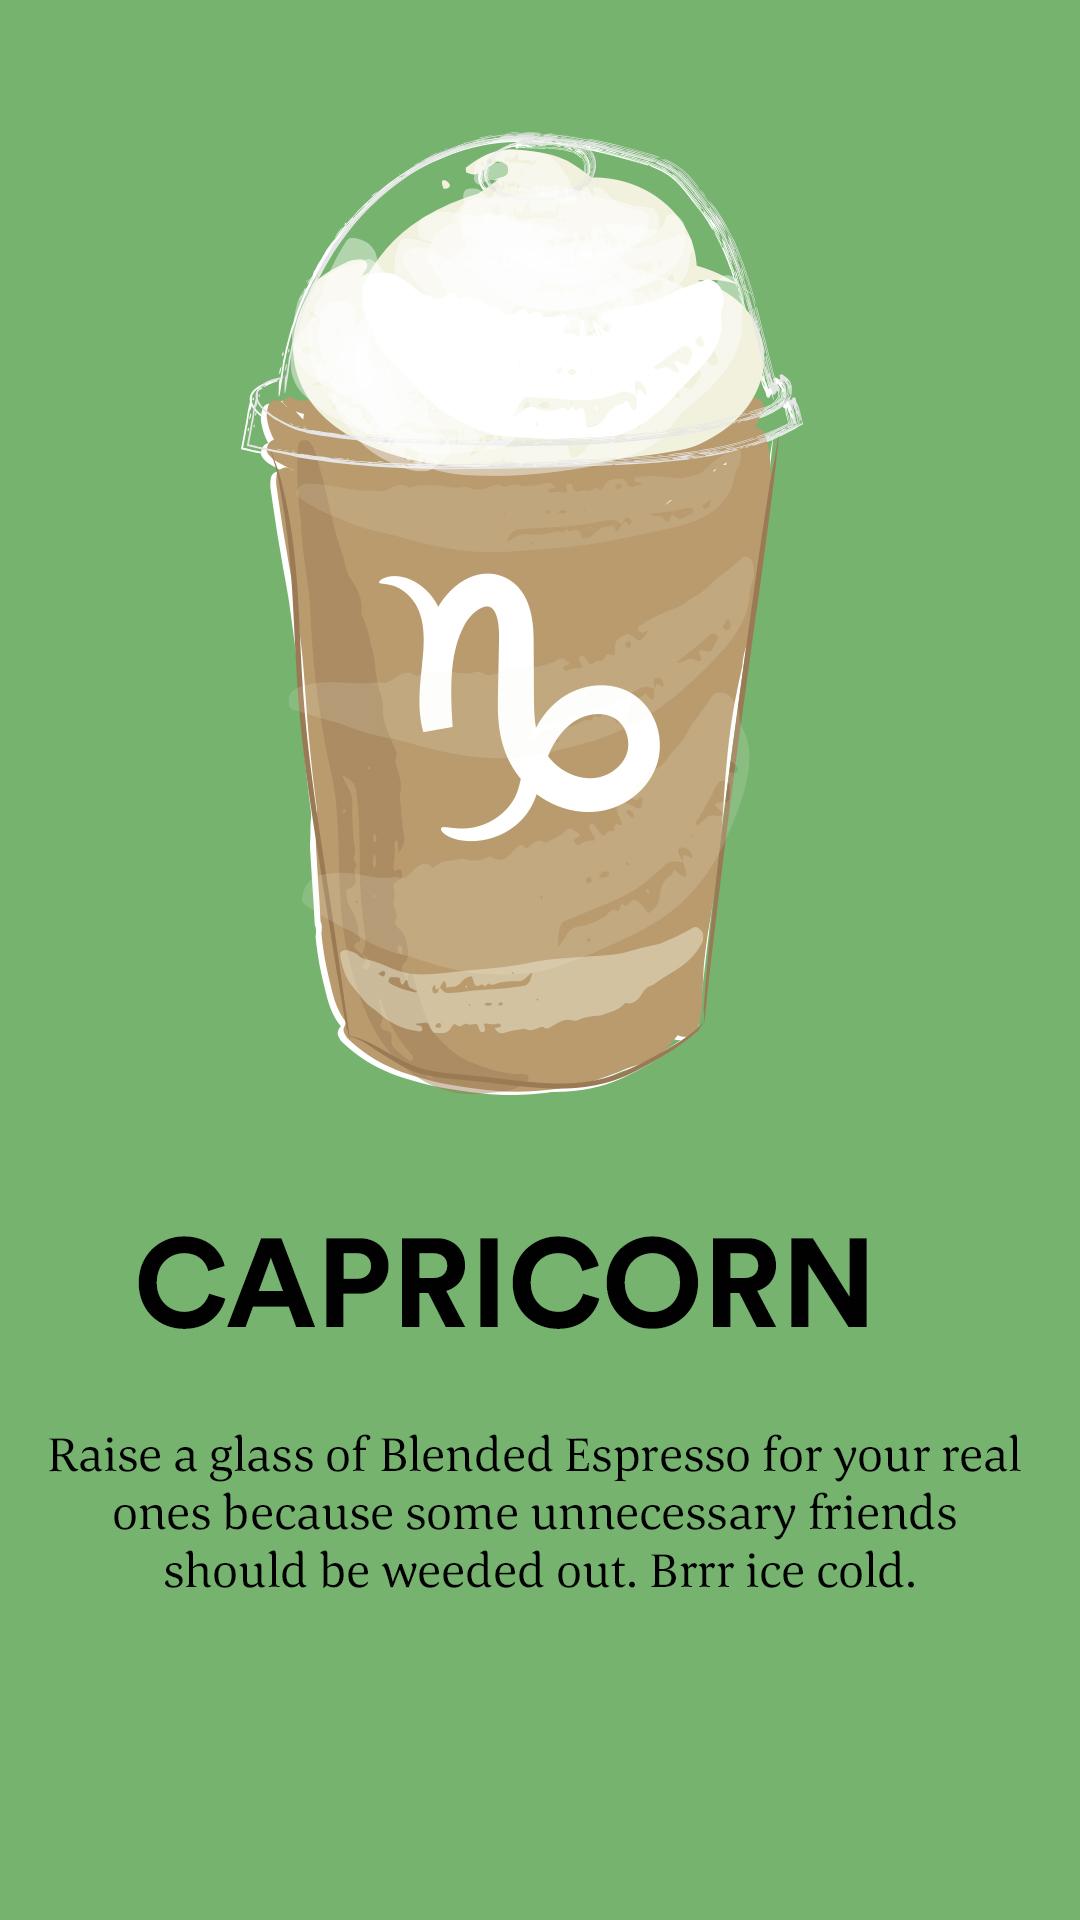 CoffeeHoroscopesArtboard 1 copy 9.jpg